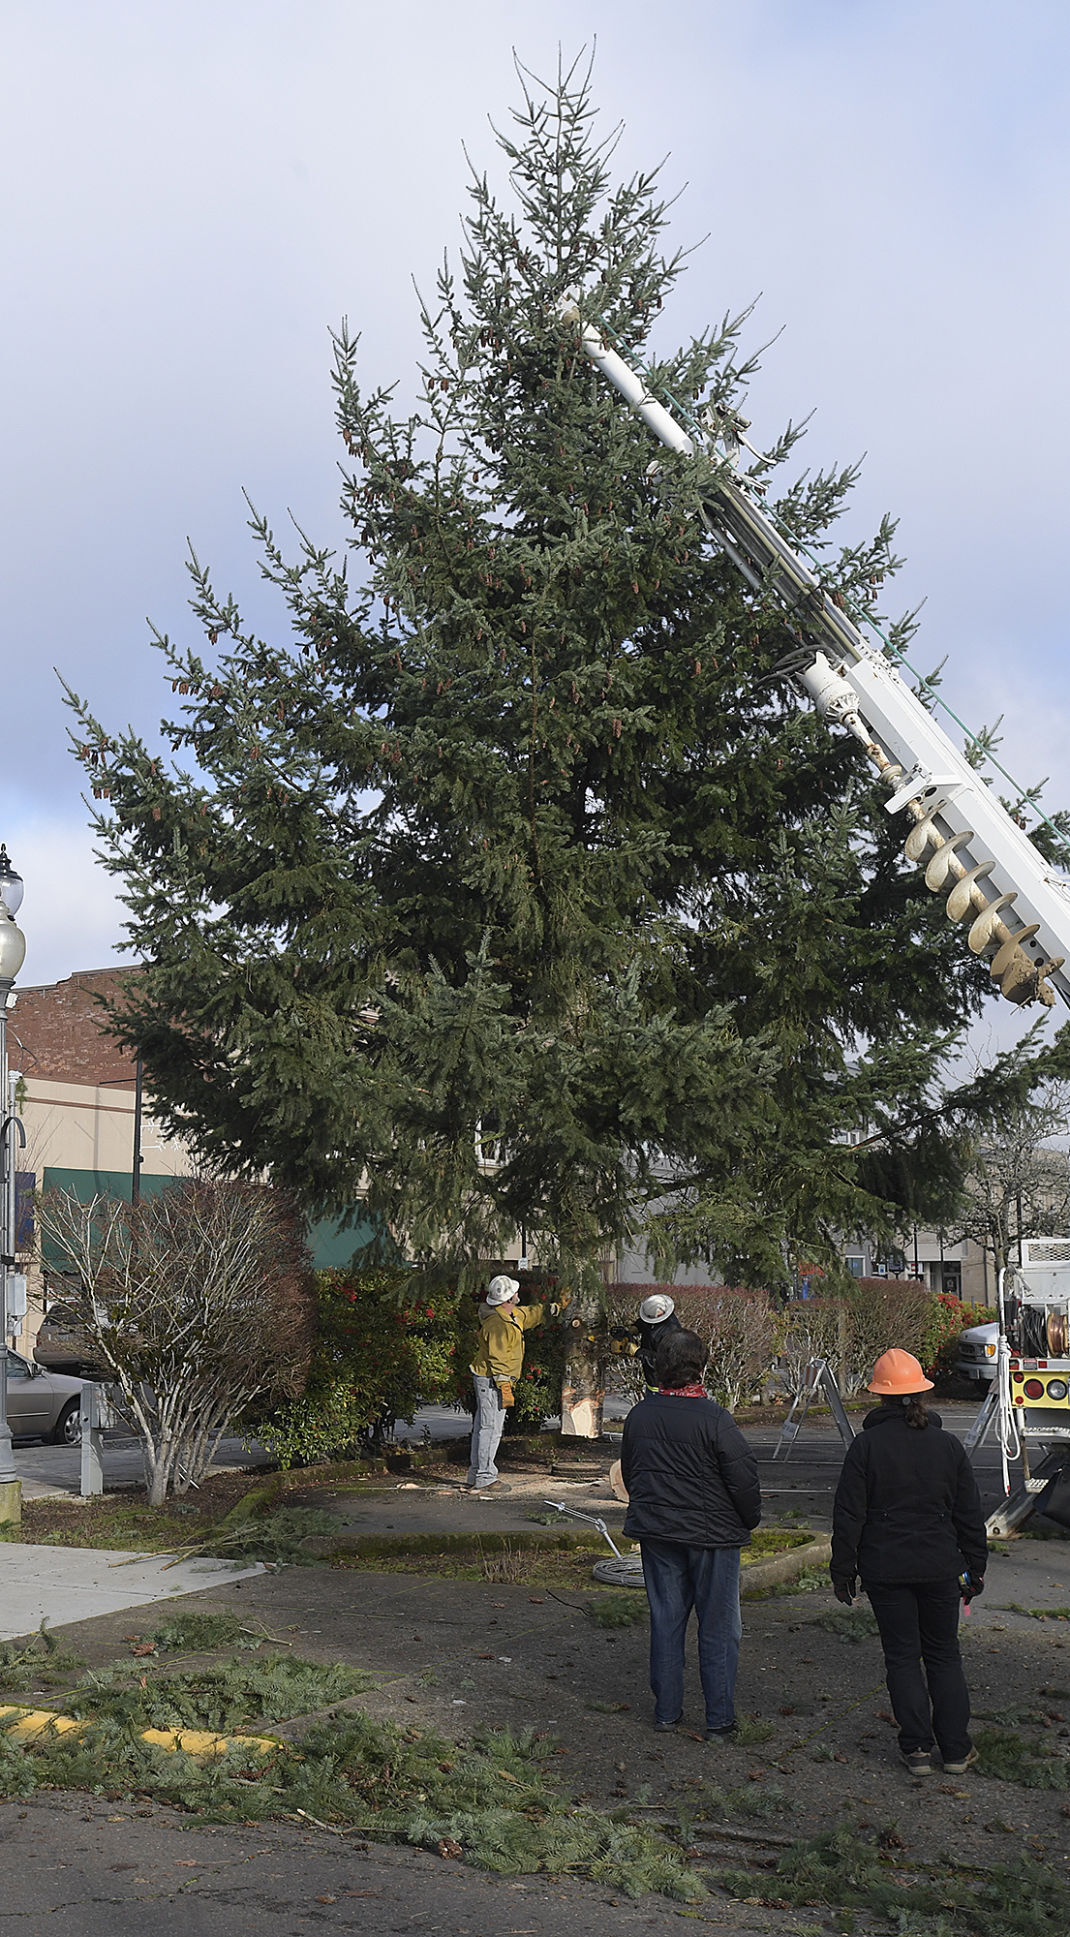 120220-adh-nws-Albany Christmas Tree02-my